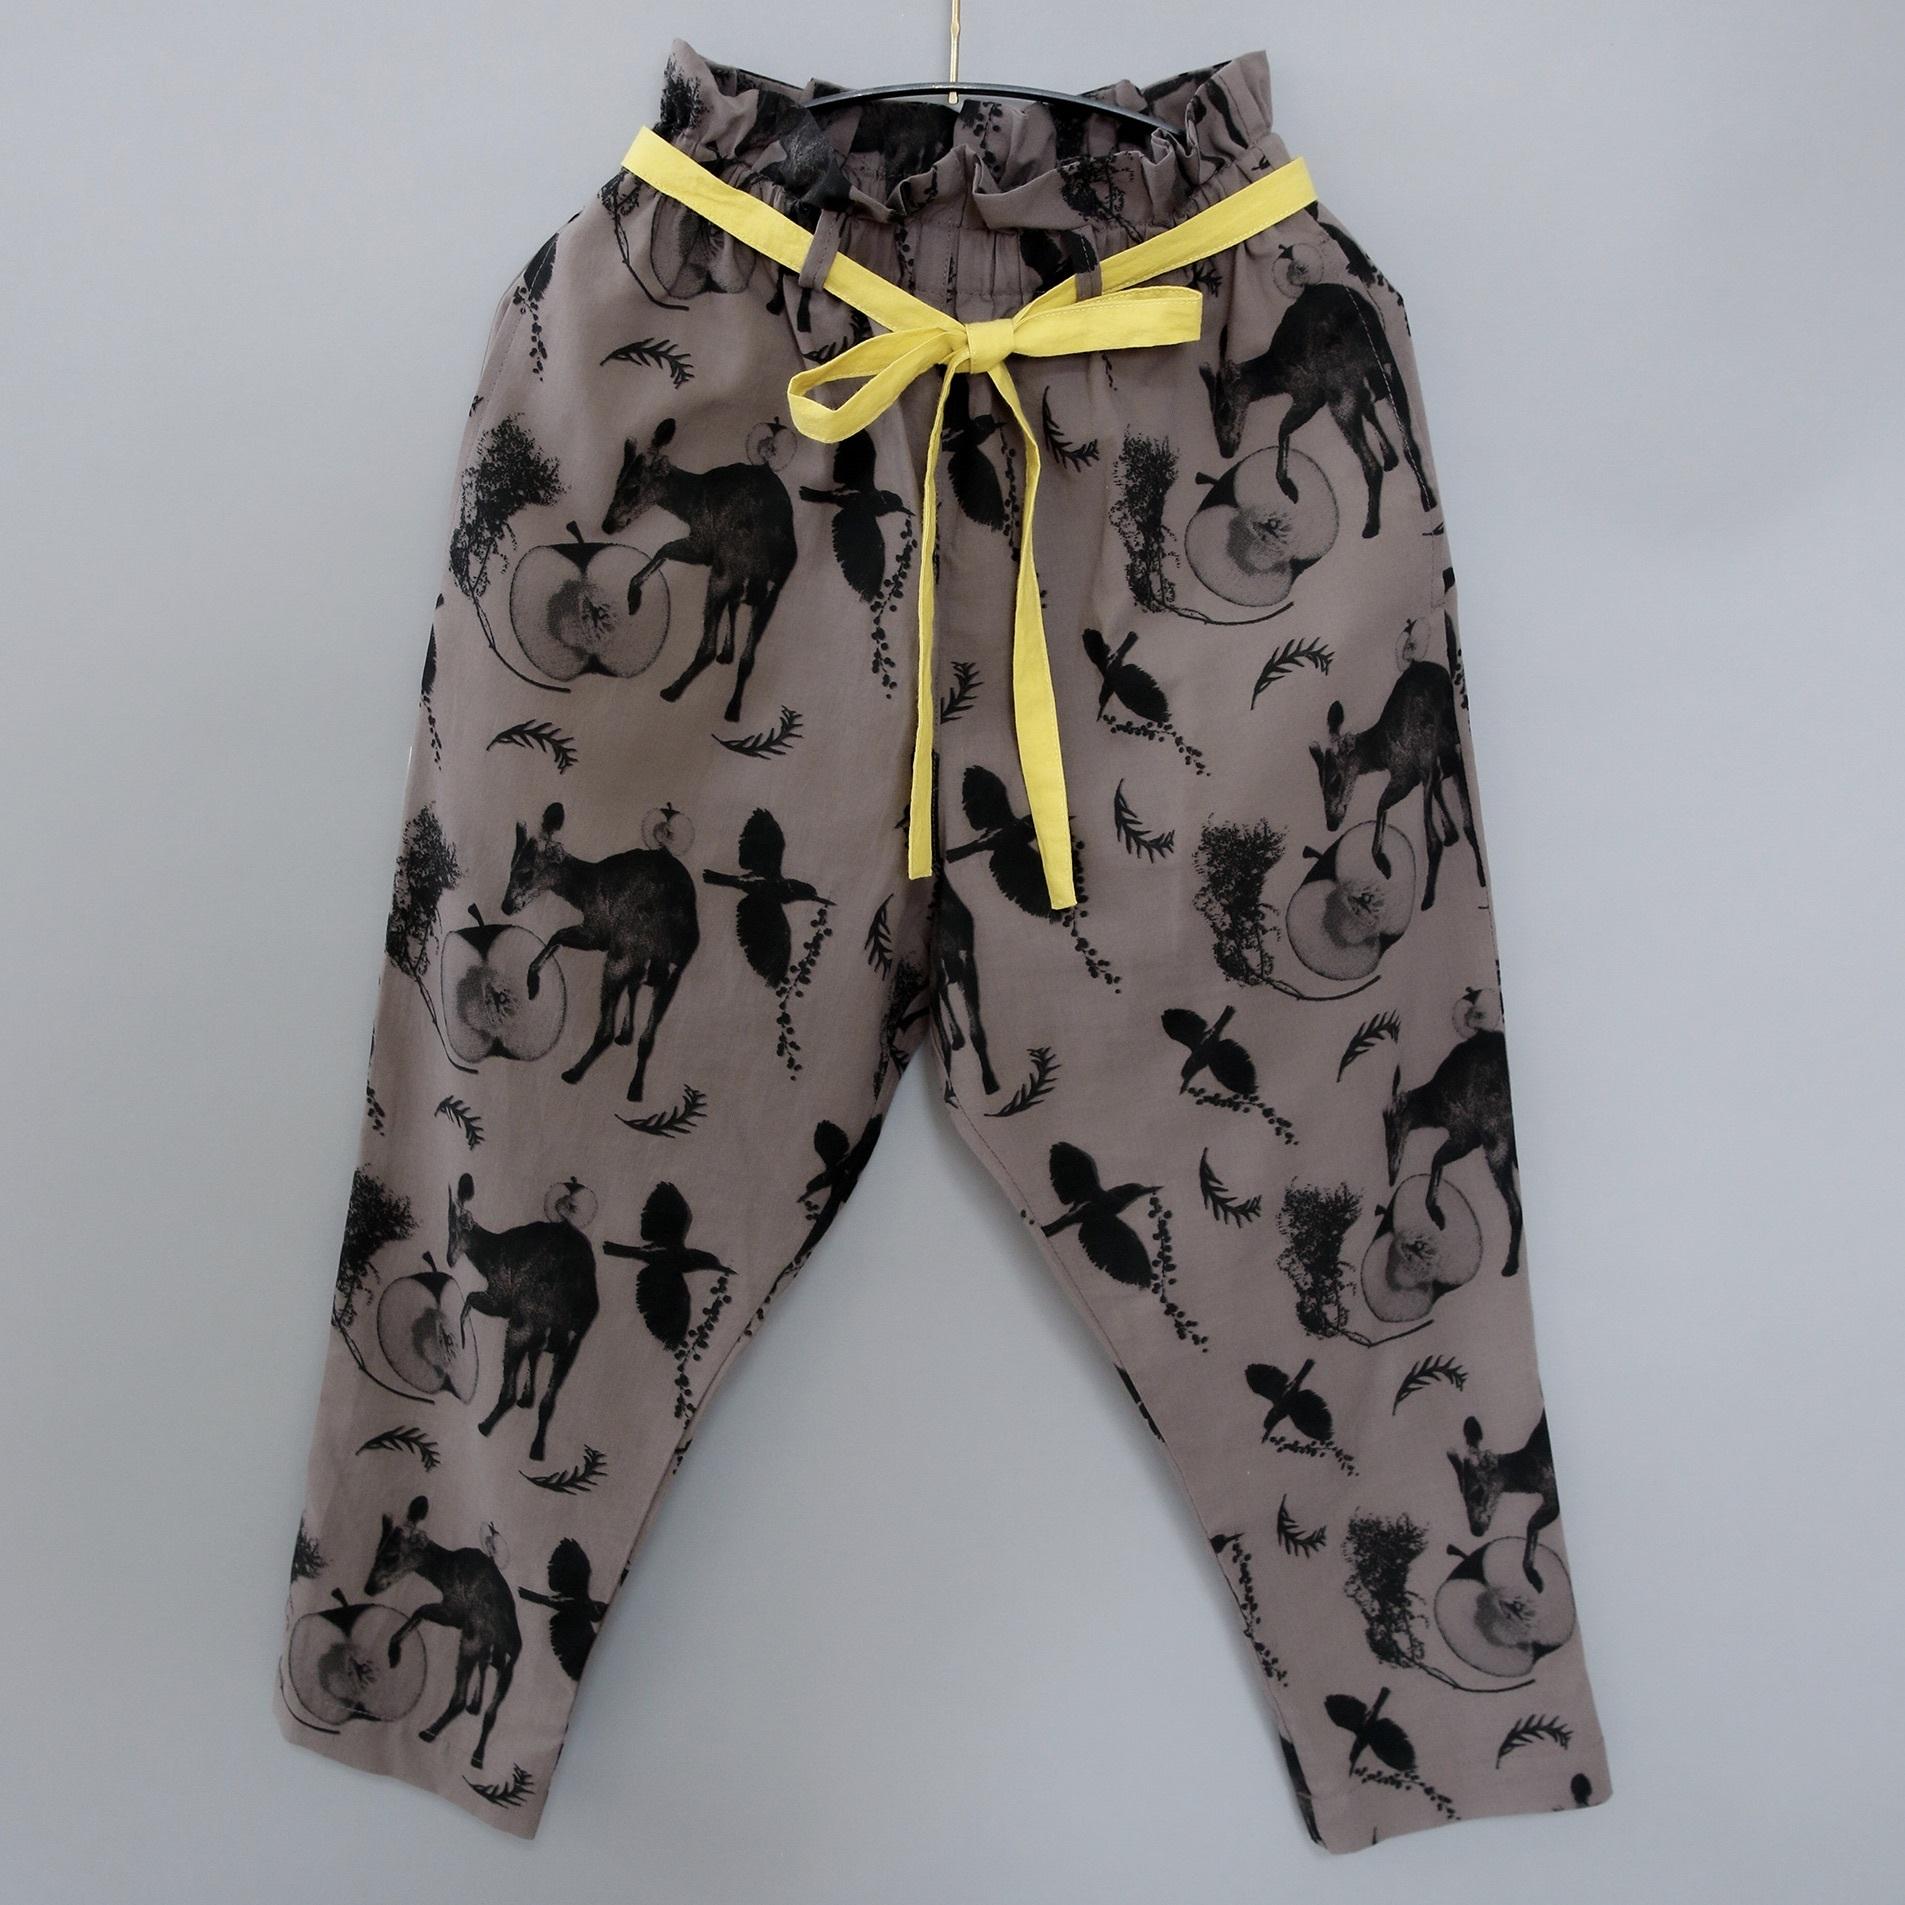 《michirico 2021SS》Flora and fauna pants / charcoal / L・XL・XXL